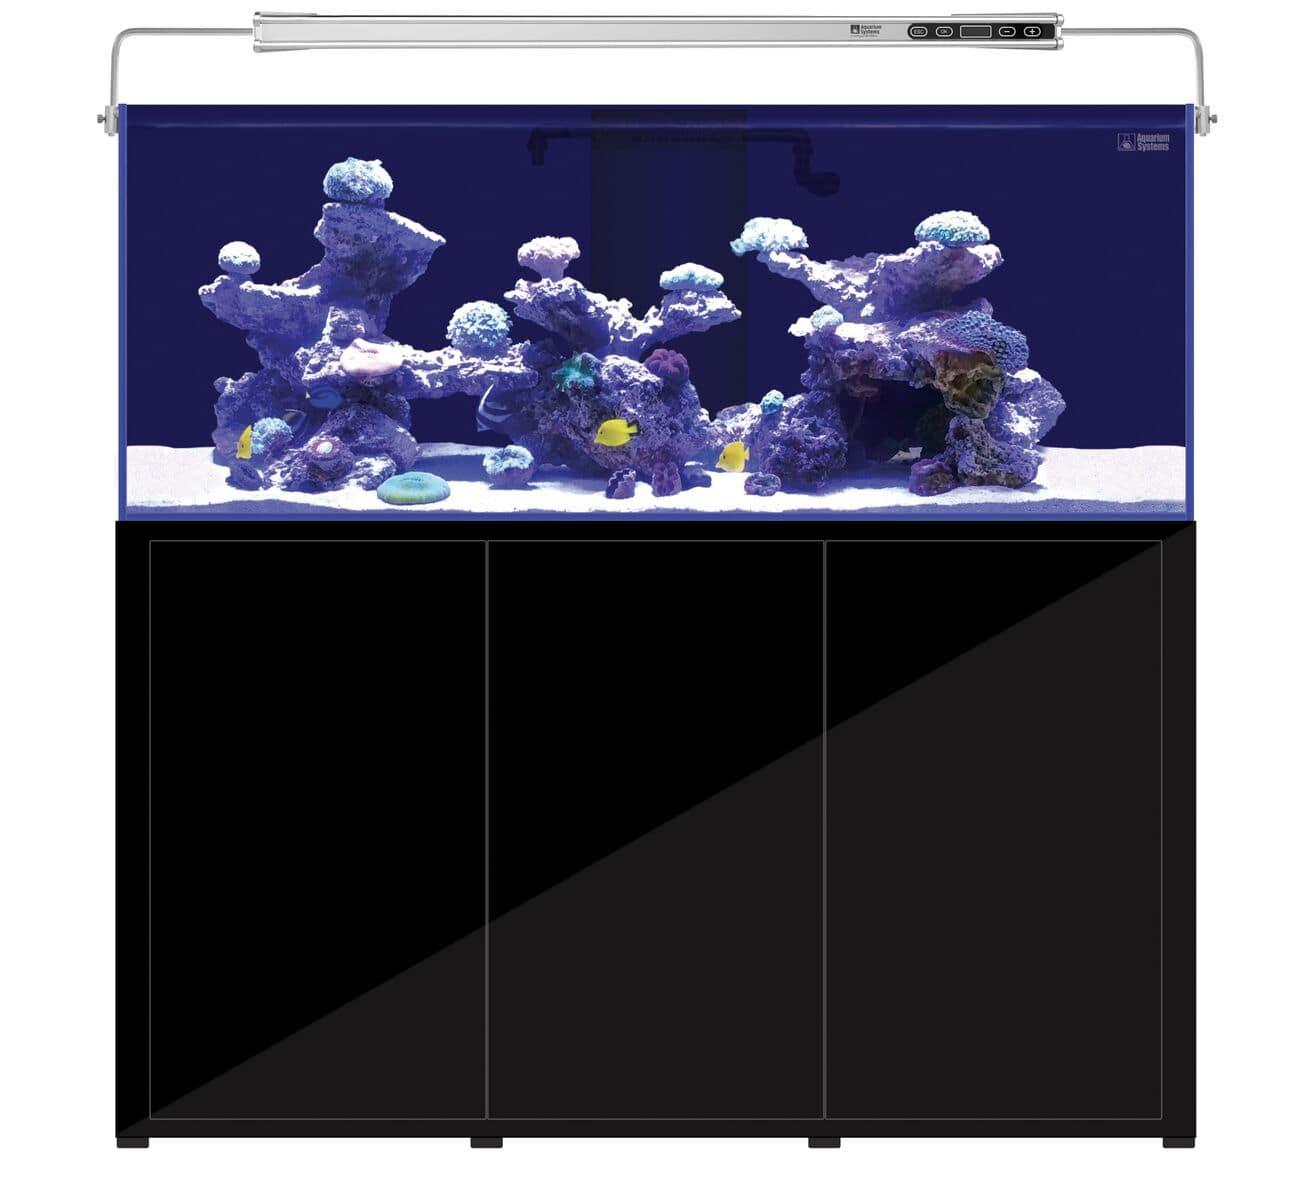 AQUARIUM SYSTEMS L\'Aquarium 720 Noir version 2.0 combinaison aquarium 464 L et meuble